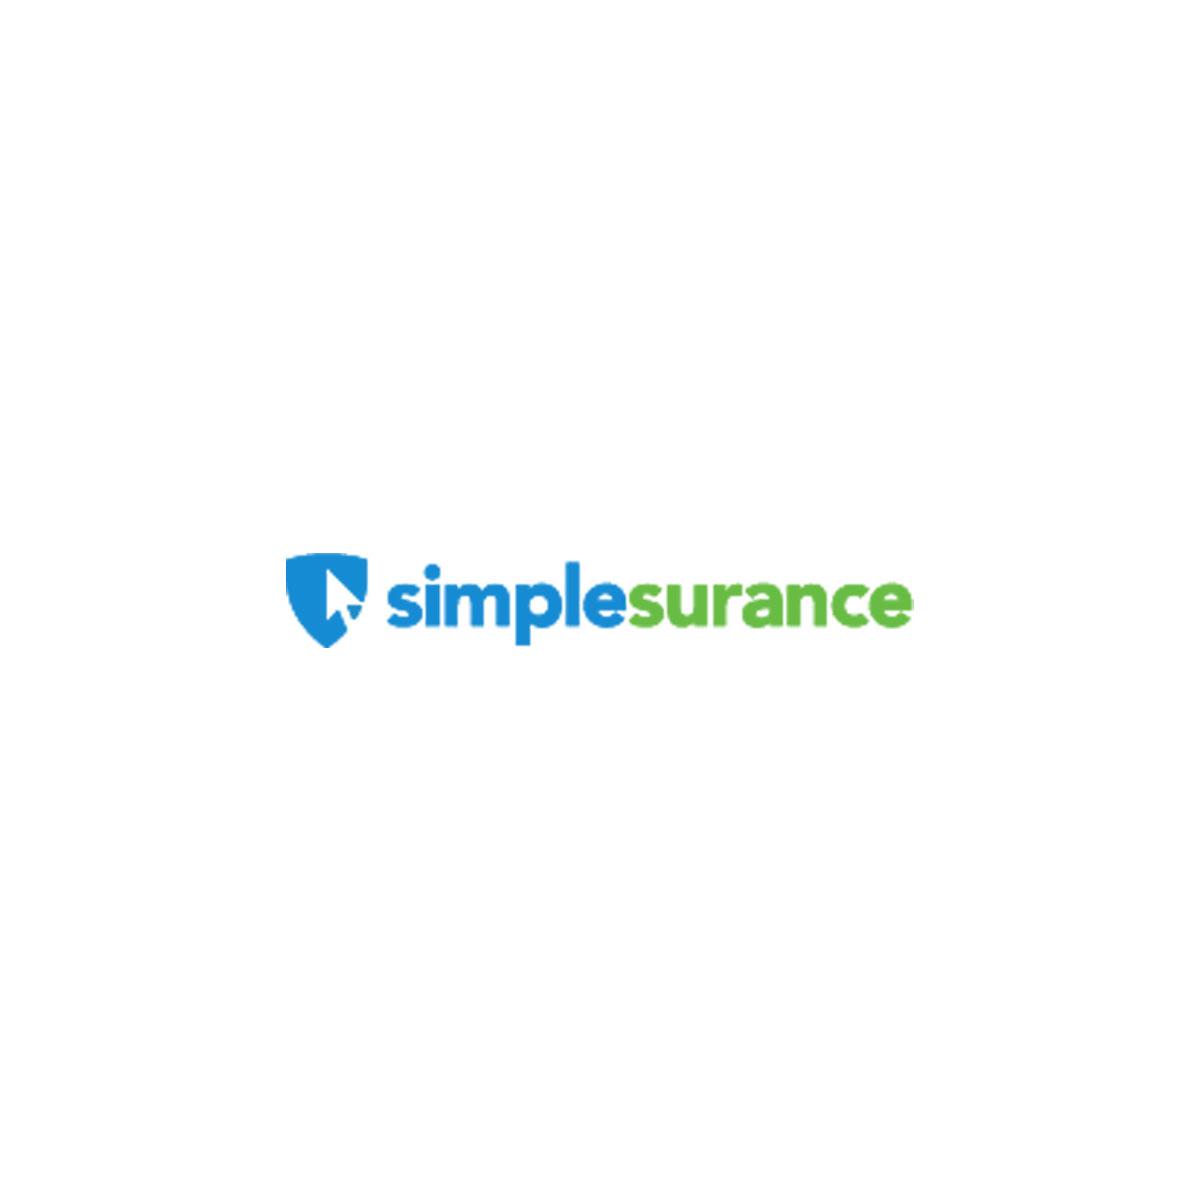 simplesurance-logo